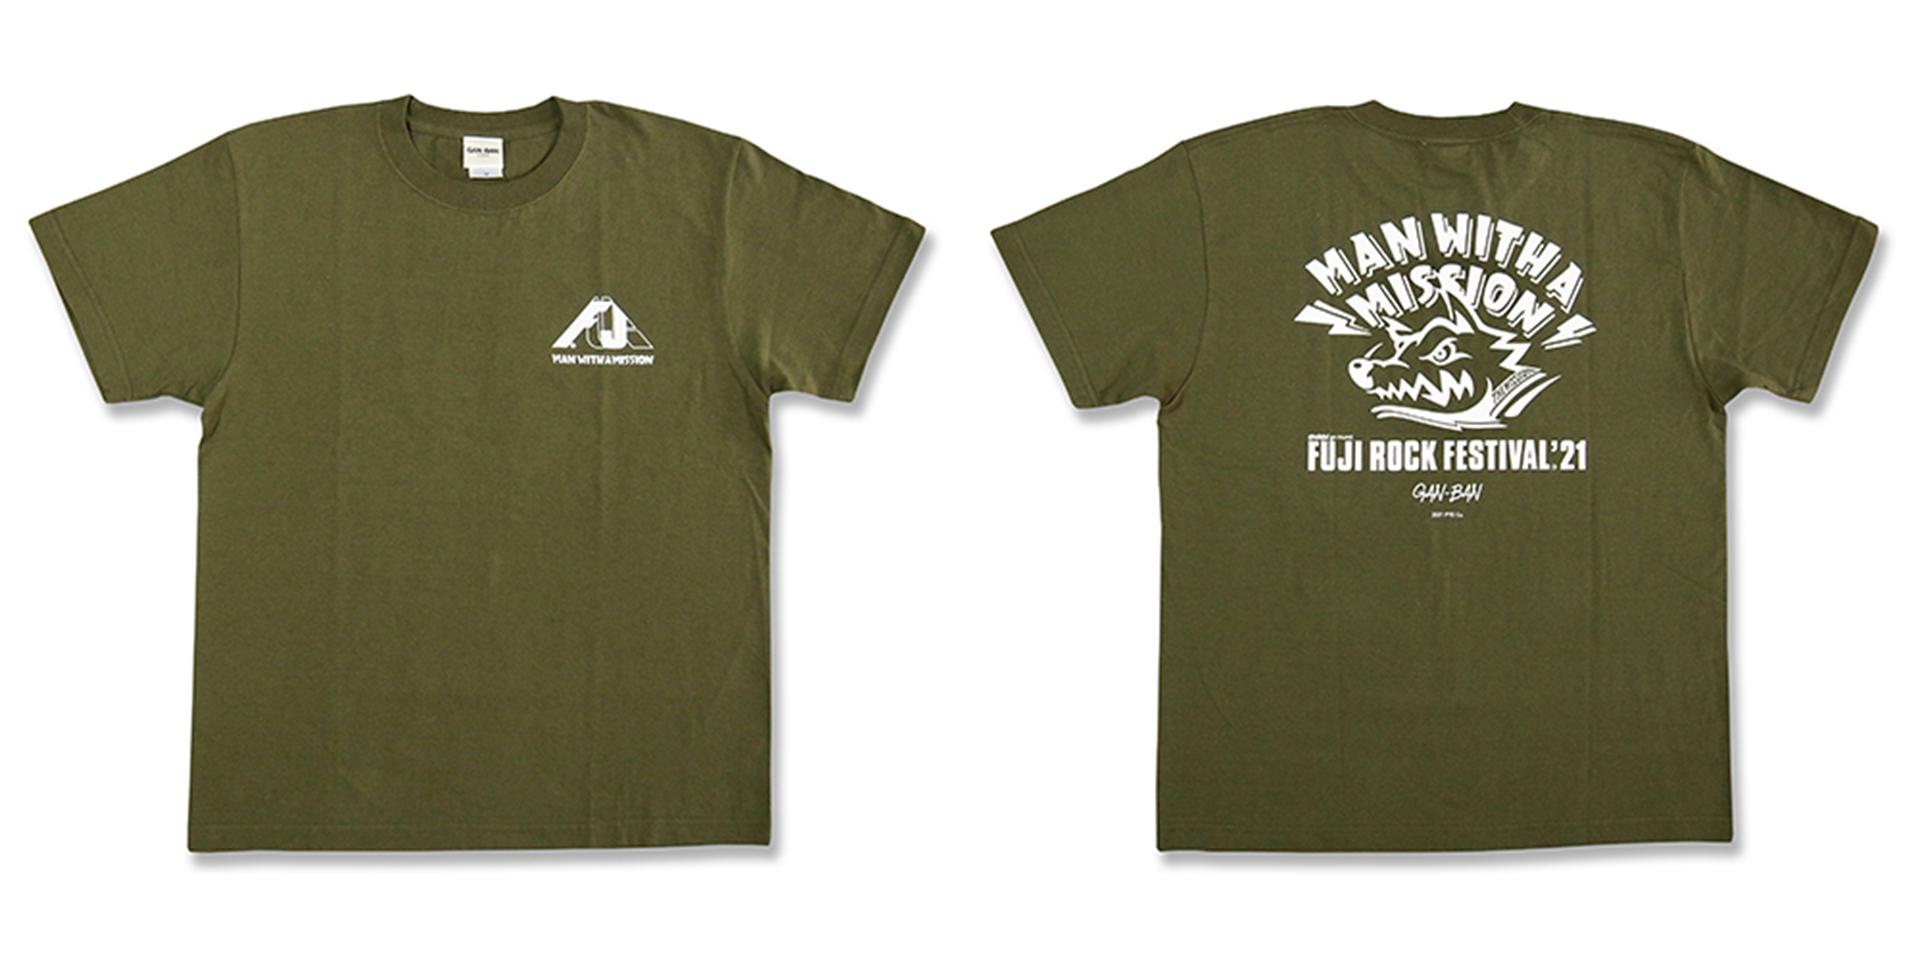 fujirock-2021-lineup03_02 フジロック第三弾にザ・クロマニヨンズ、DYGLら!未発表Tシャツの情報も #fujirock